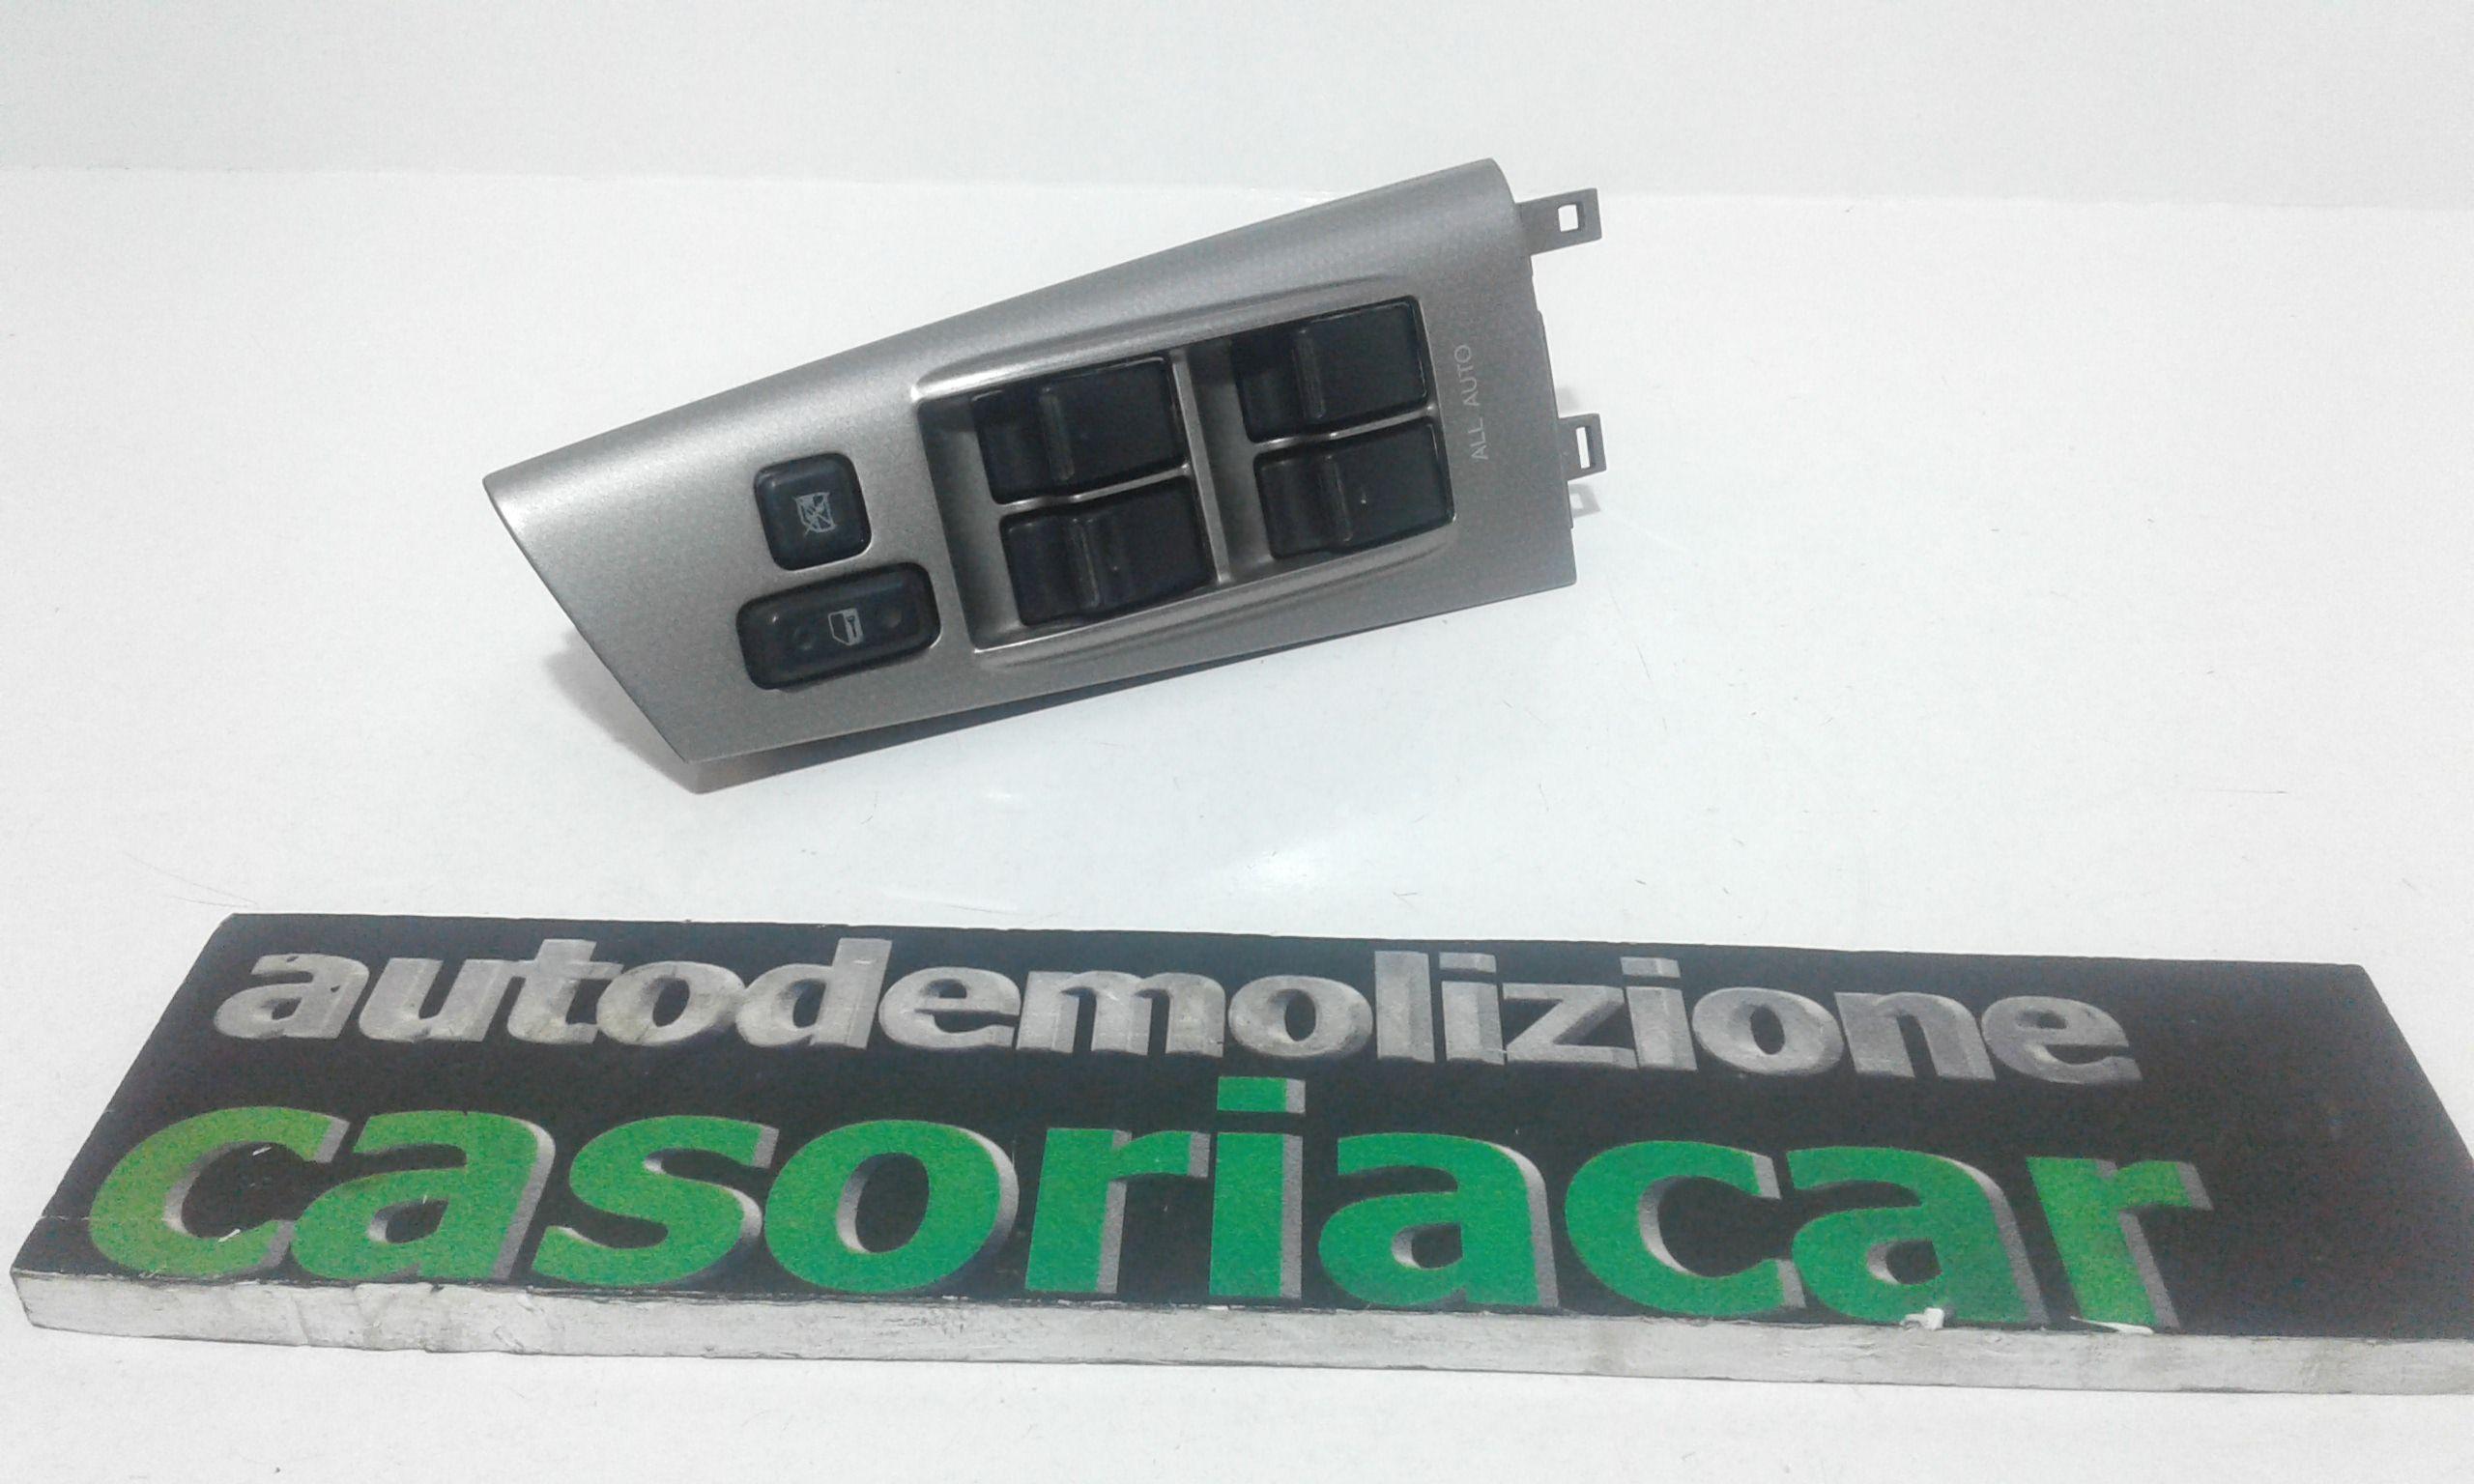 PULSANTIERA ANTERIORE SINISTRA GUIDA TOYOTA Corolla Berlina 3° Serie 3-5P Benzina (2004) RICAMBI USATI